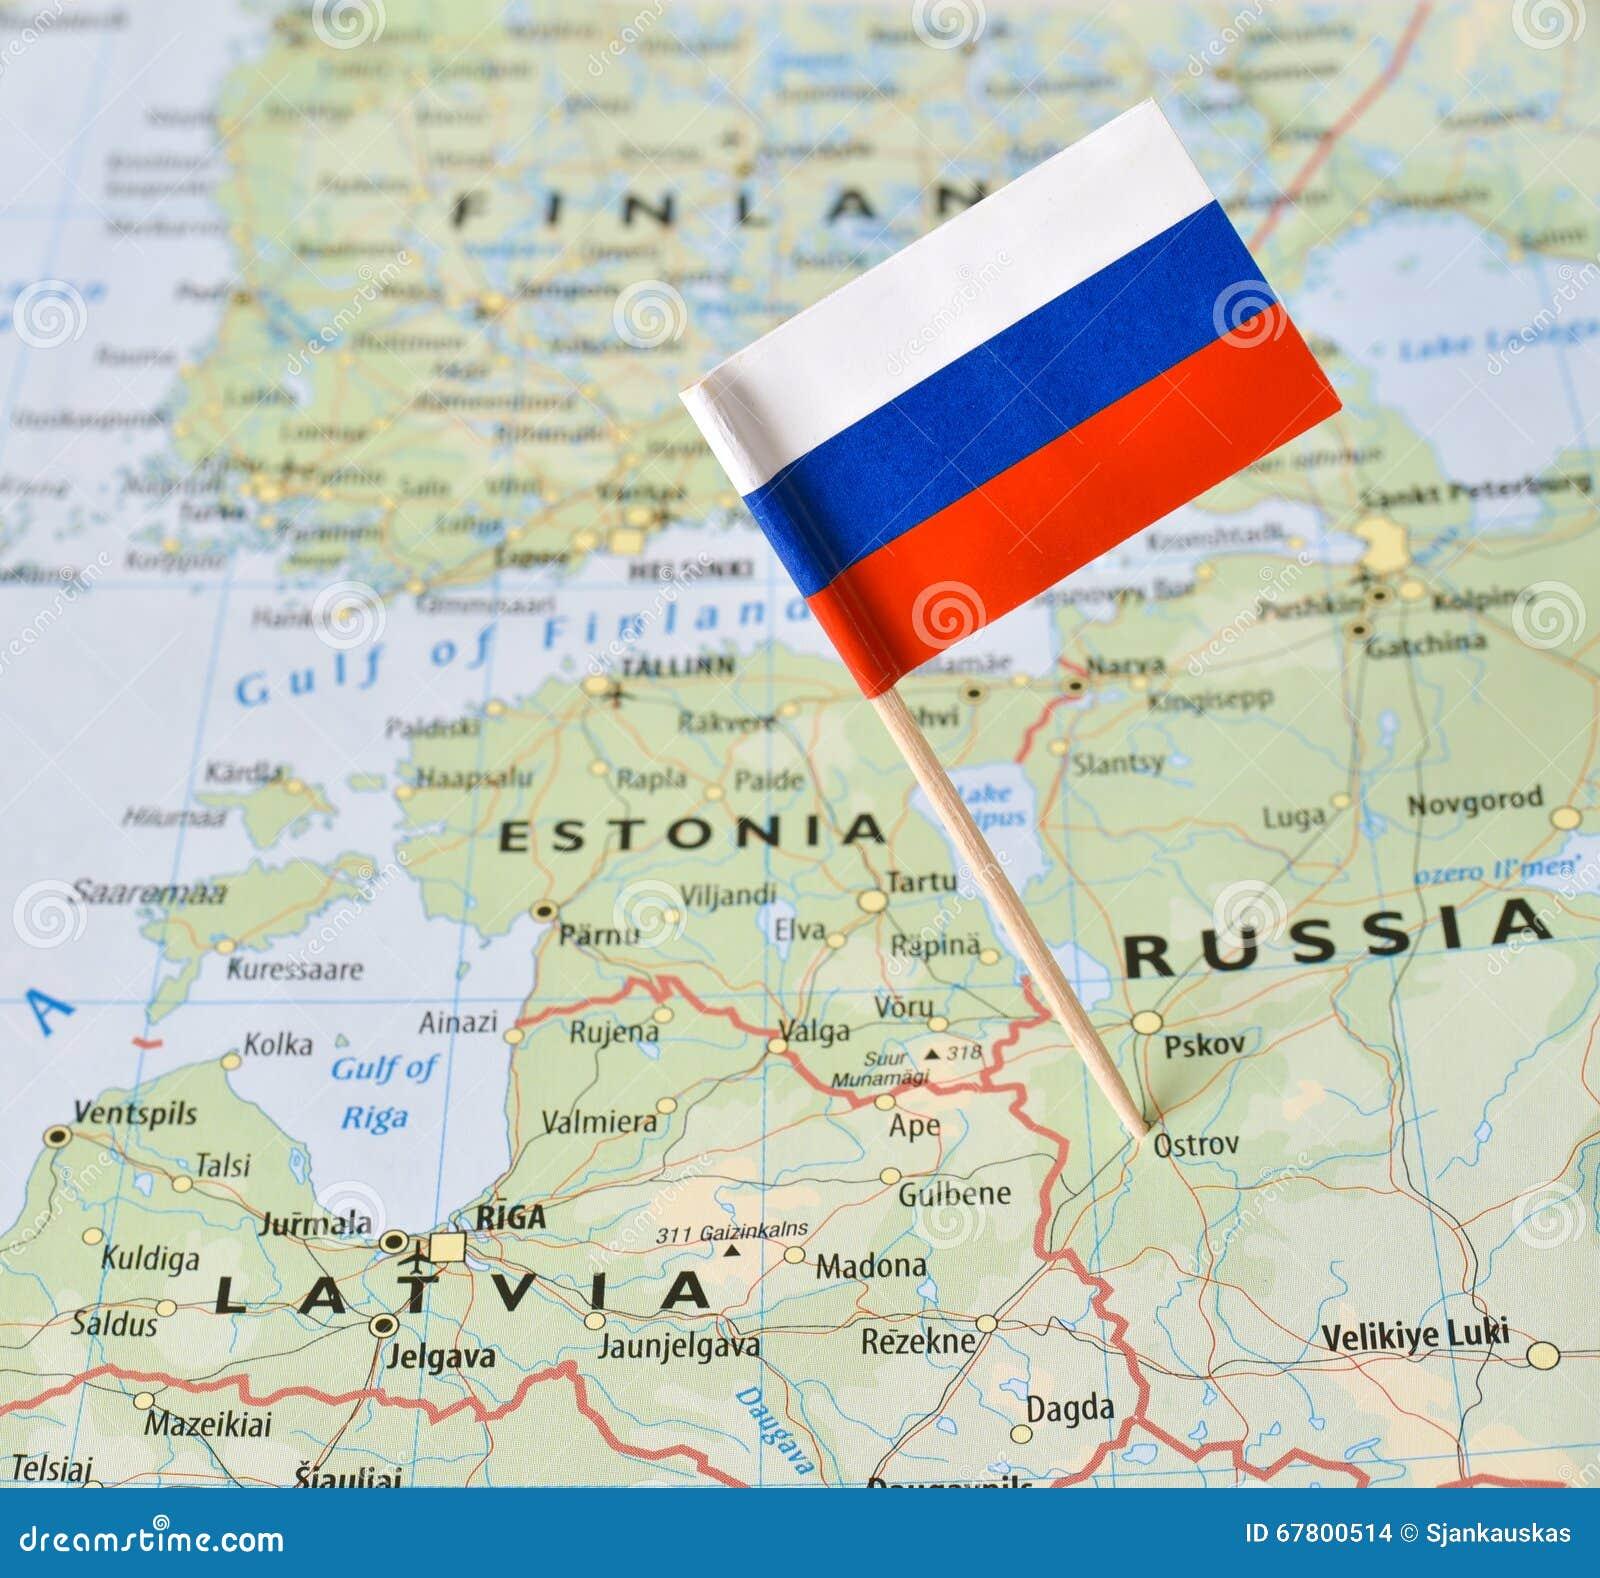 Pino da bandeira de Rússia no mapa